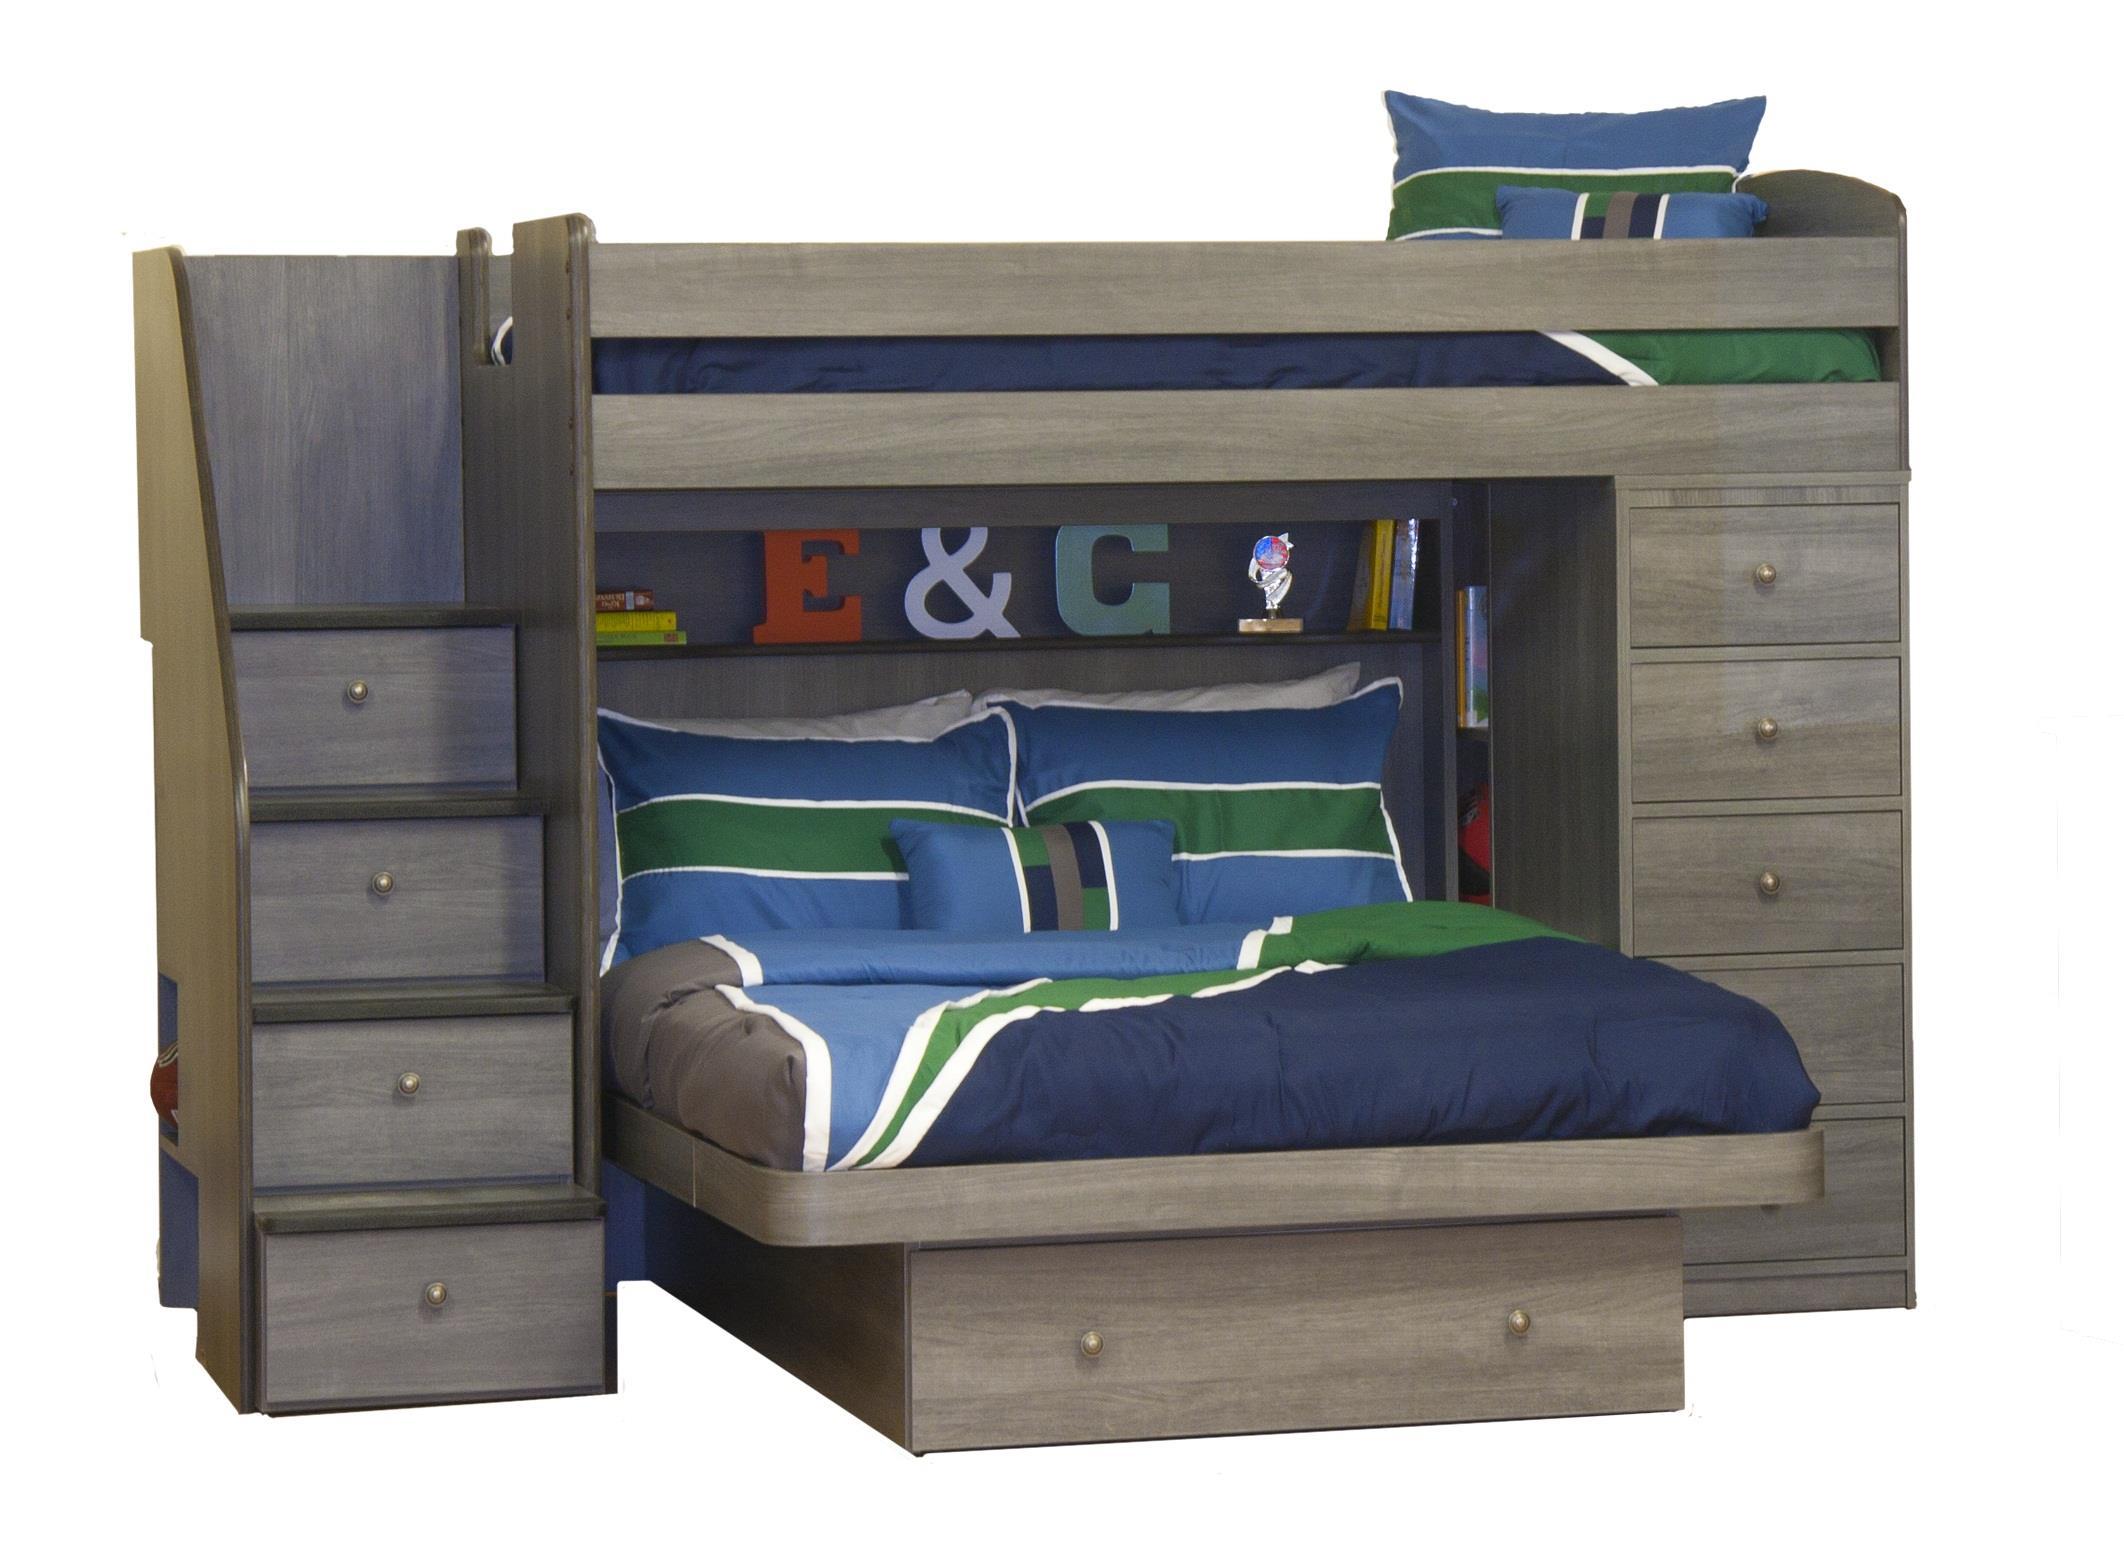 Berg Pewter Pewter Bunk Bed - Item Number: 22-816-AKIT